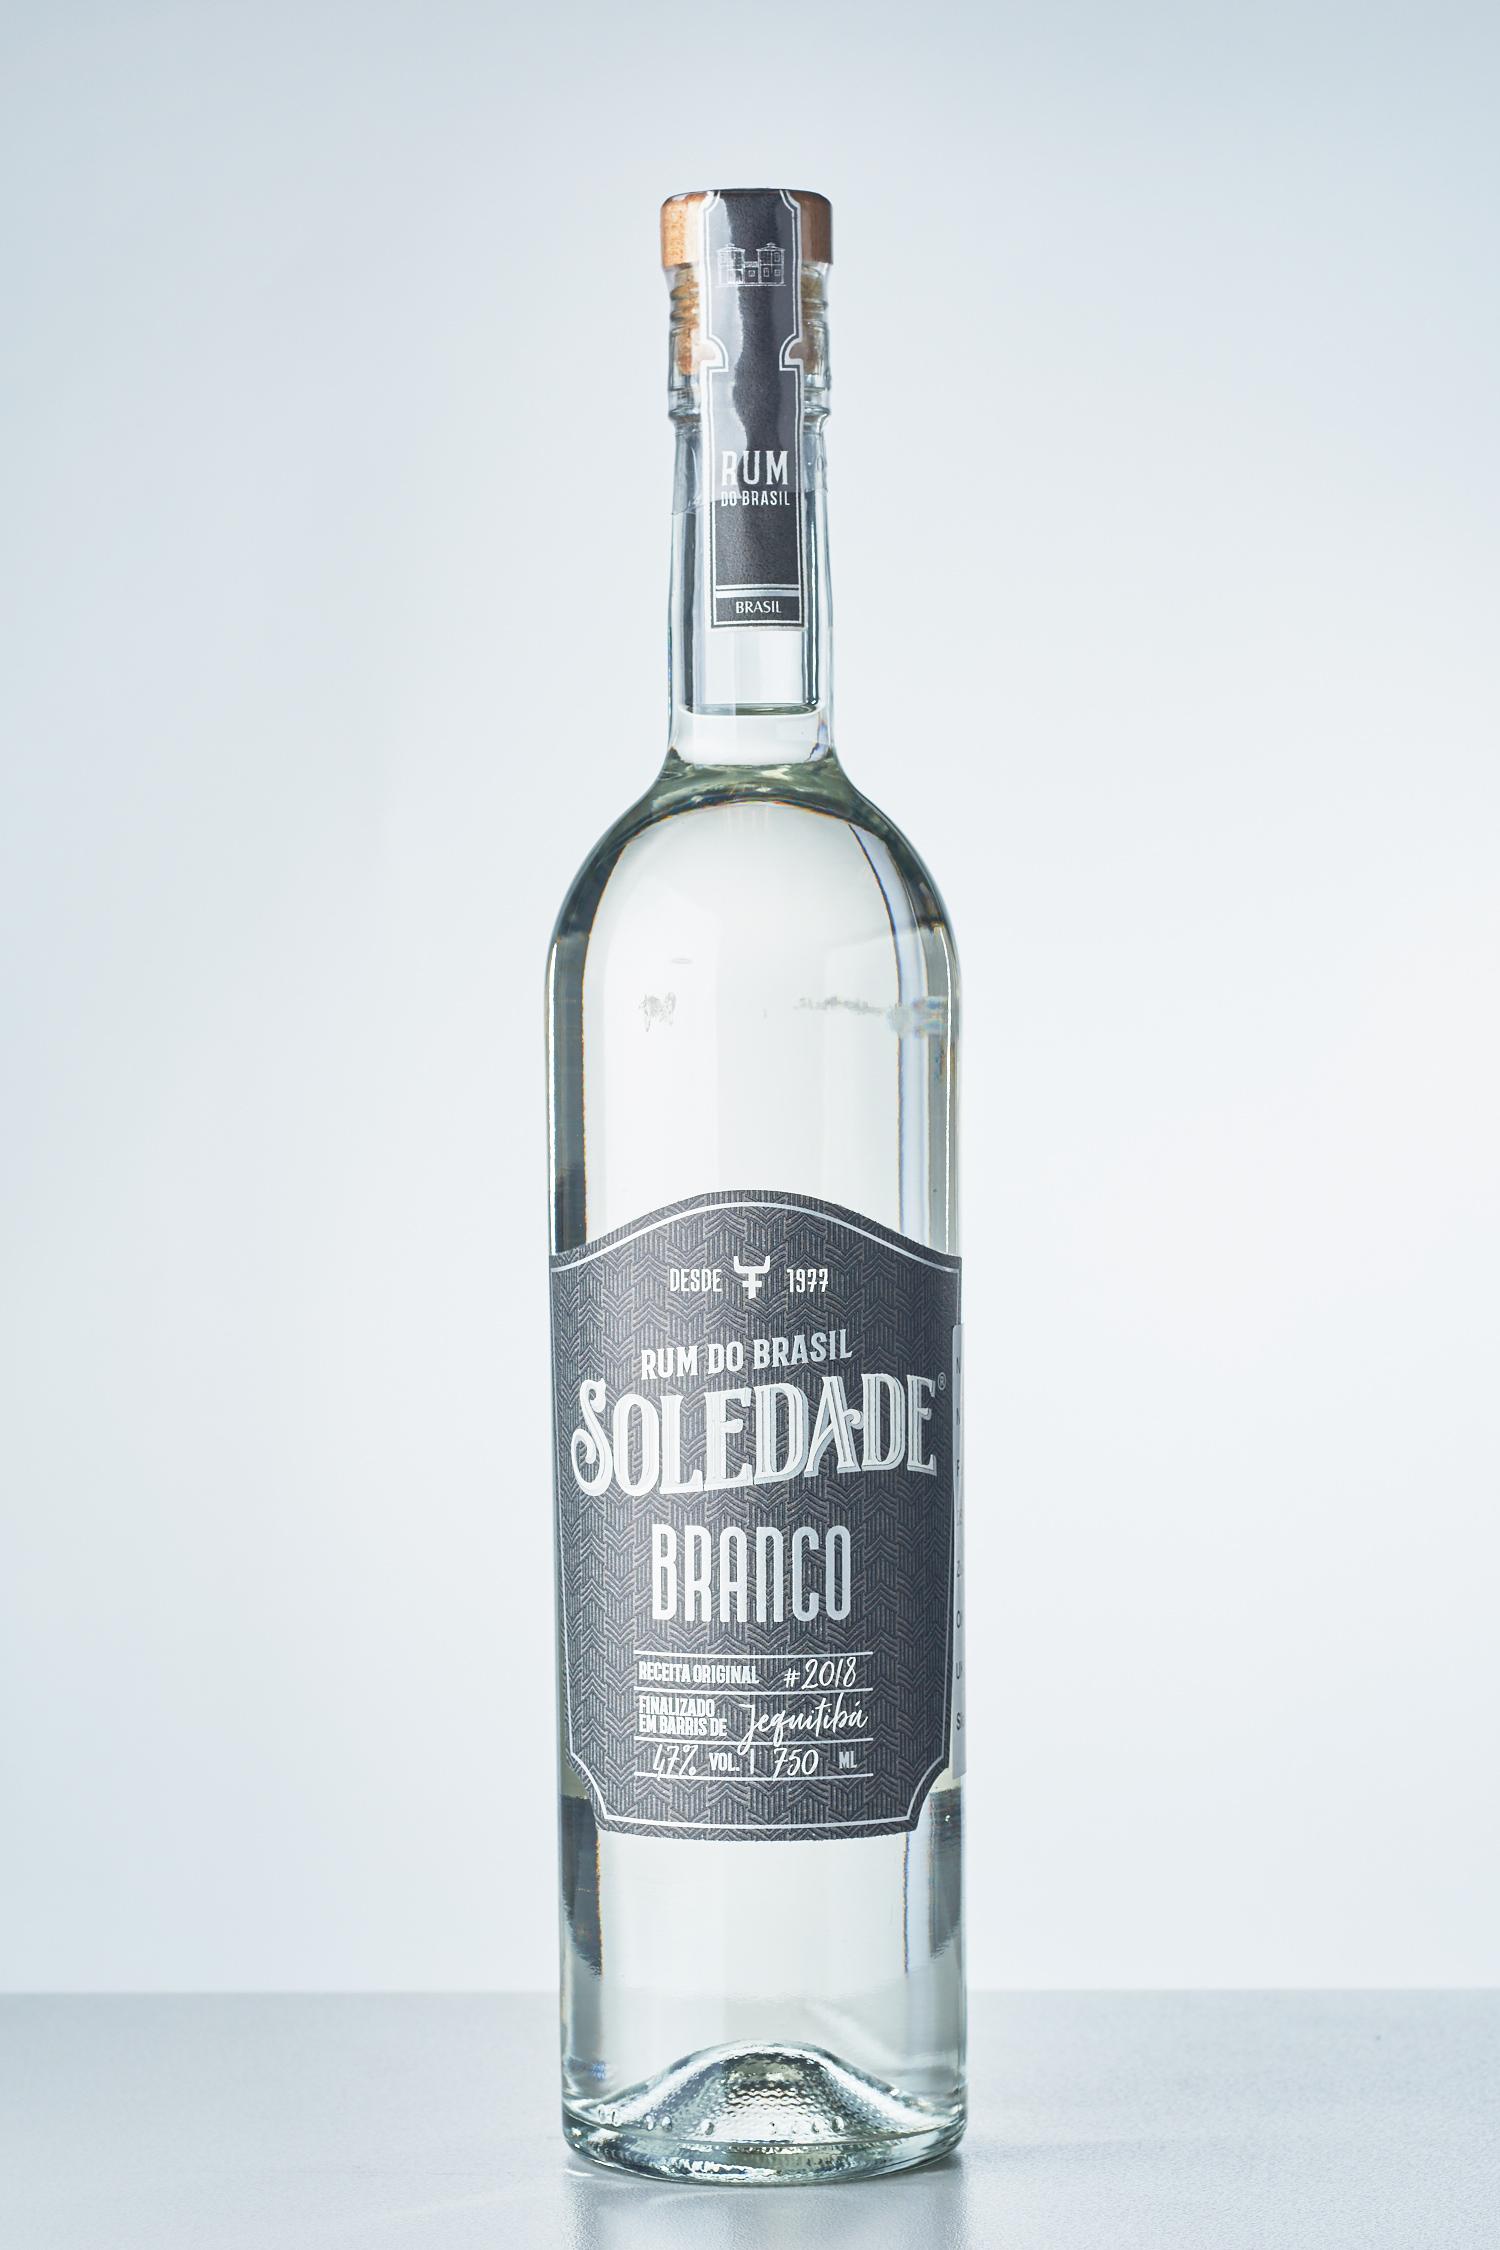 Fazenda Soledade Ltda. - Soledade Branco